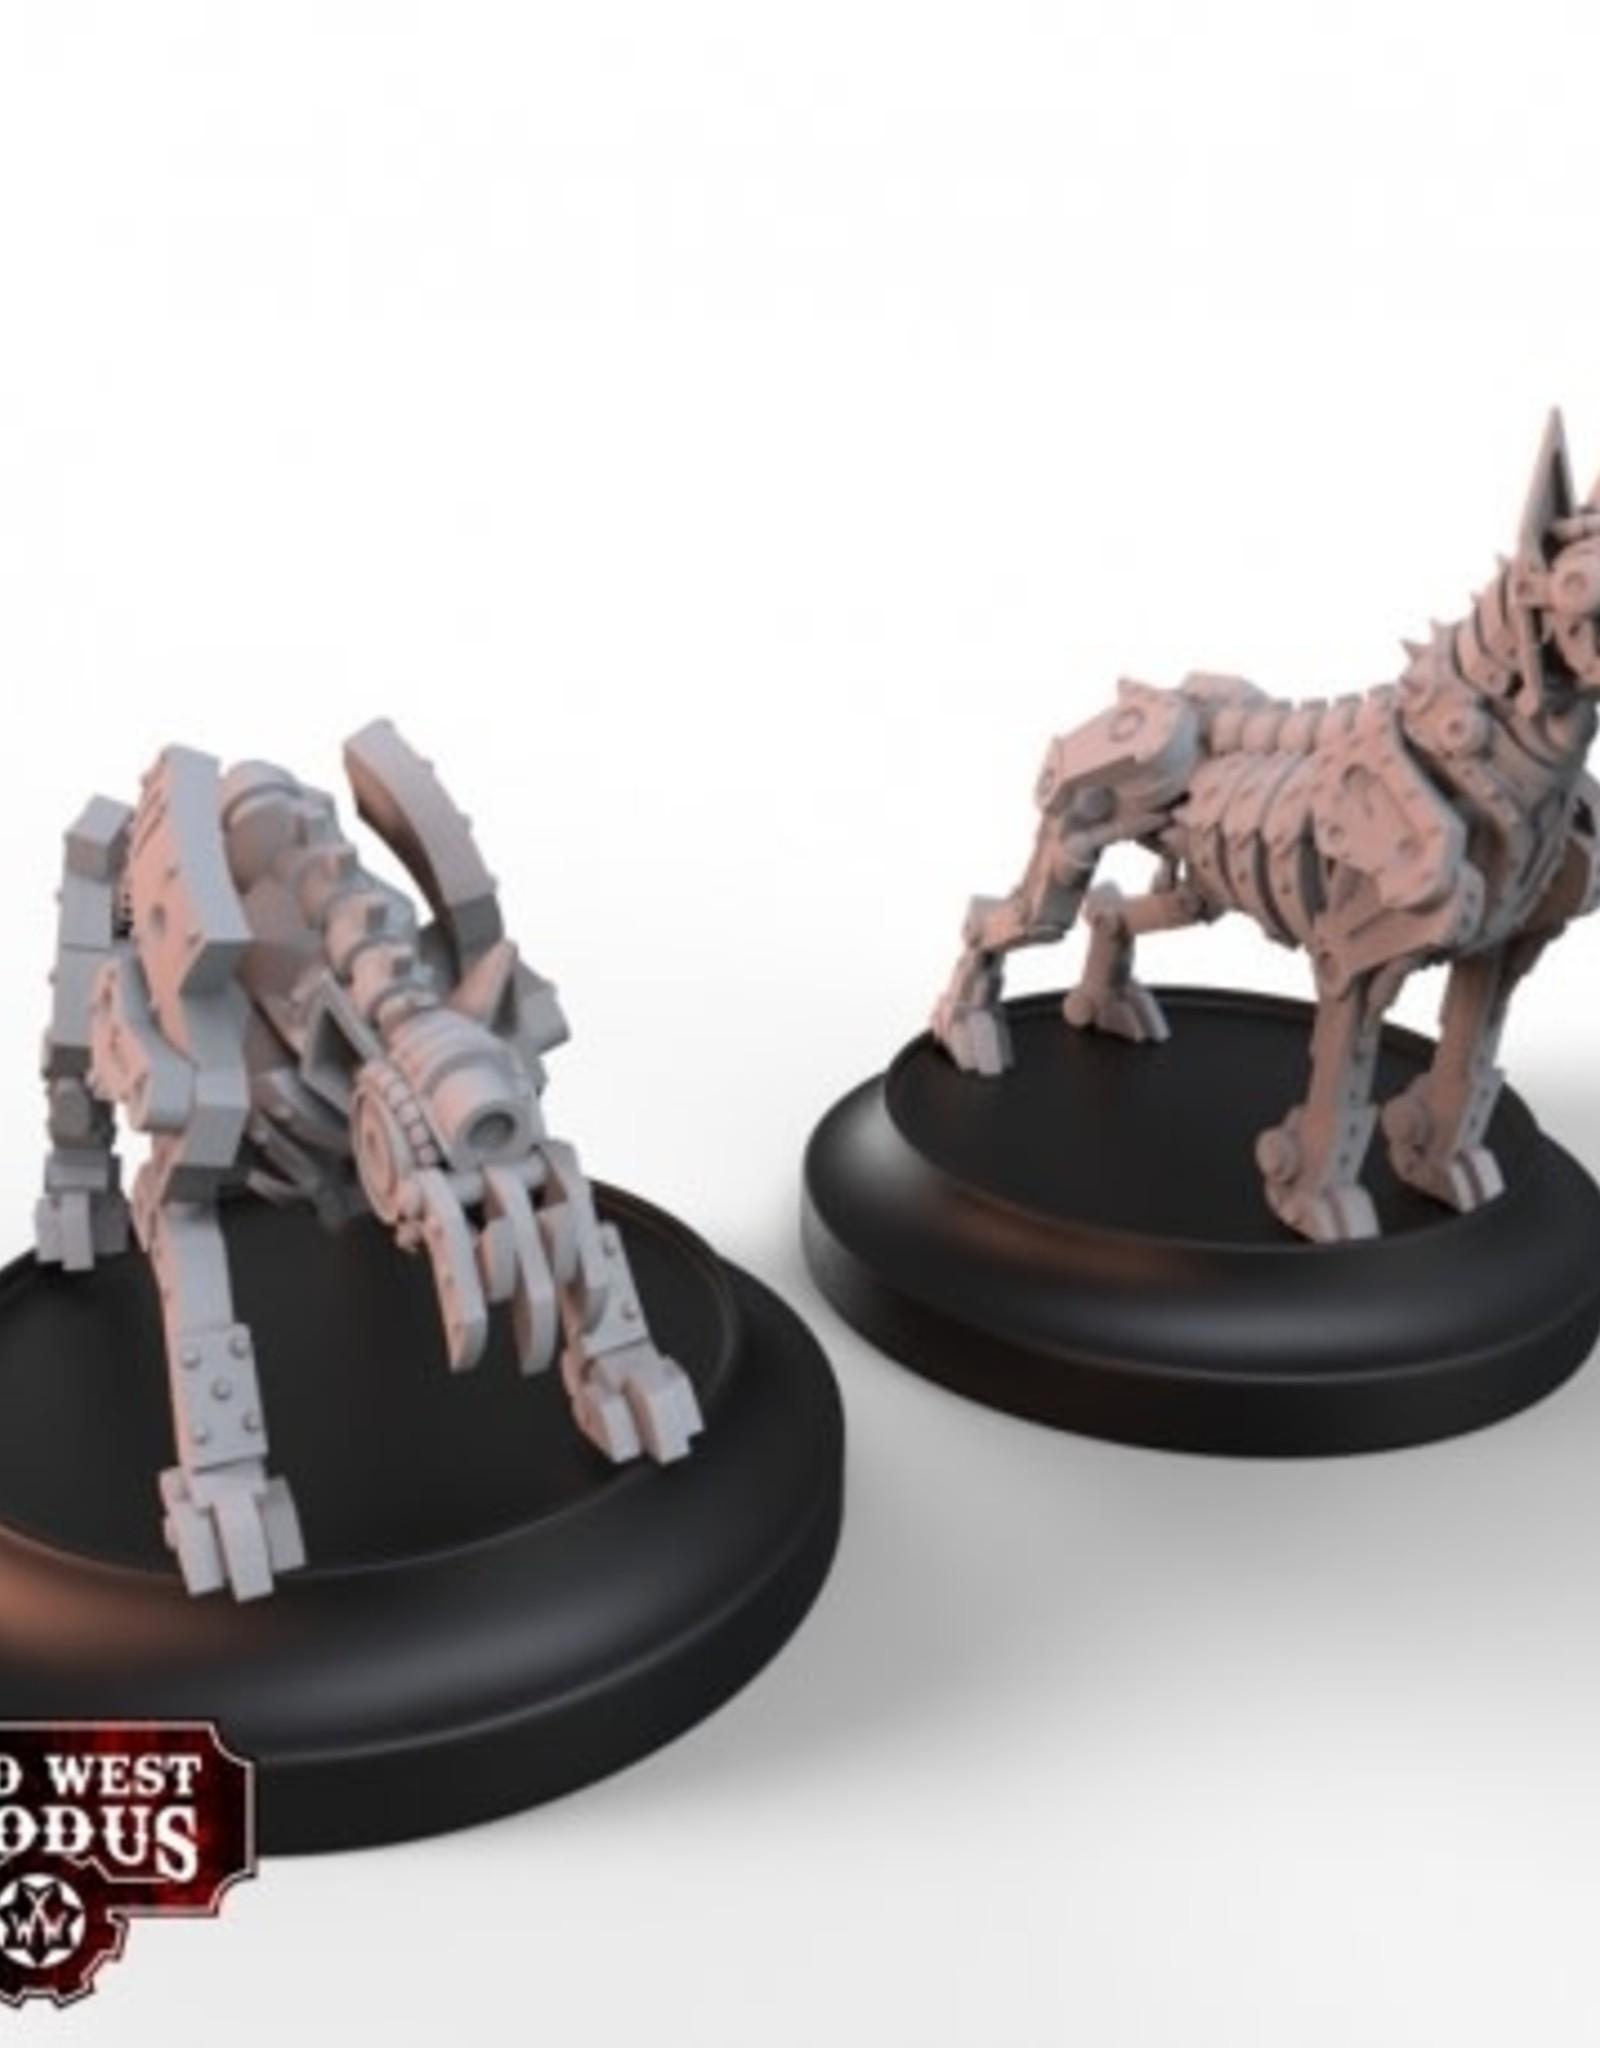 Warcradle K9 Attack Dogs